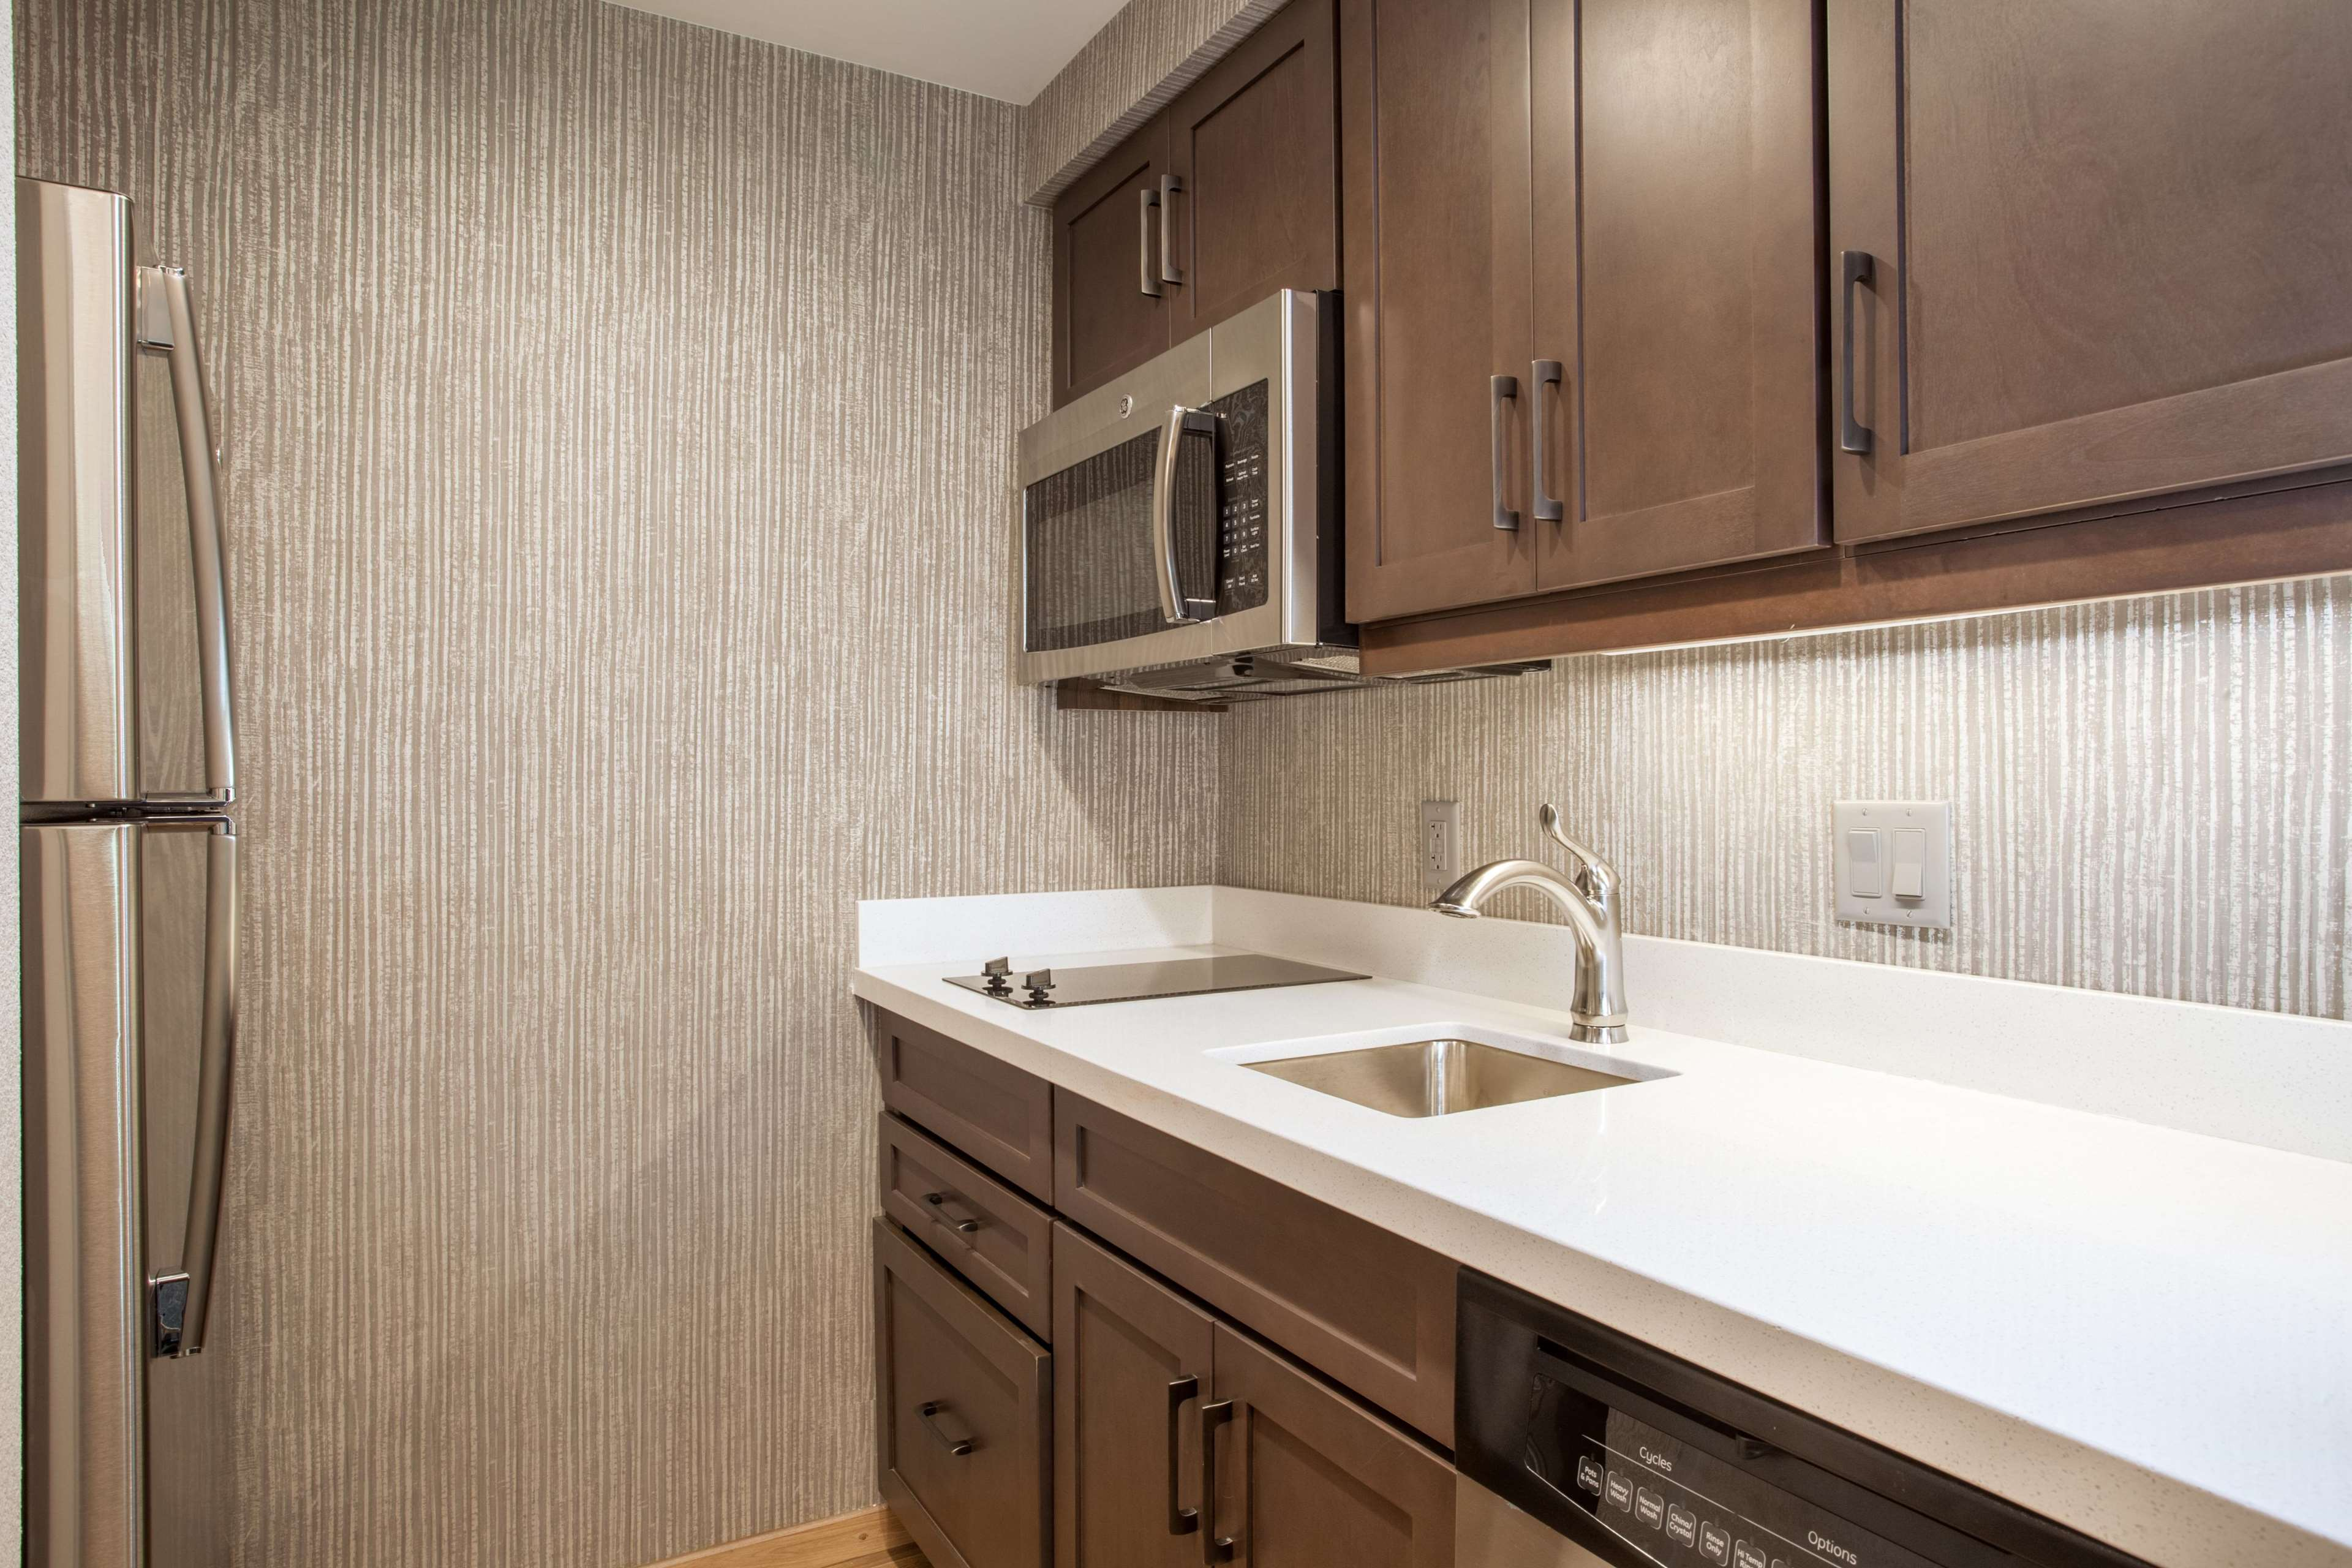 Homewood Suites by Hilton Saratoga Springs image 26